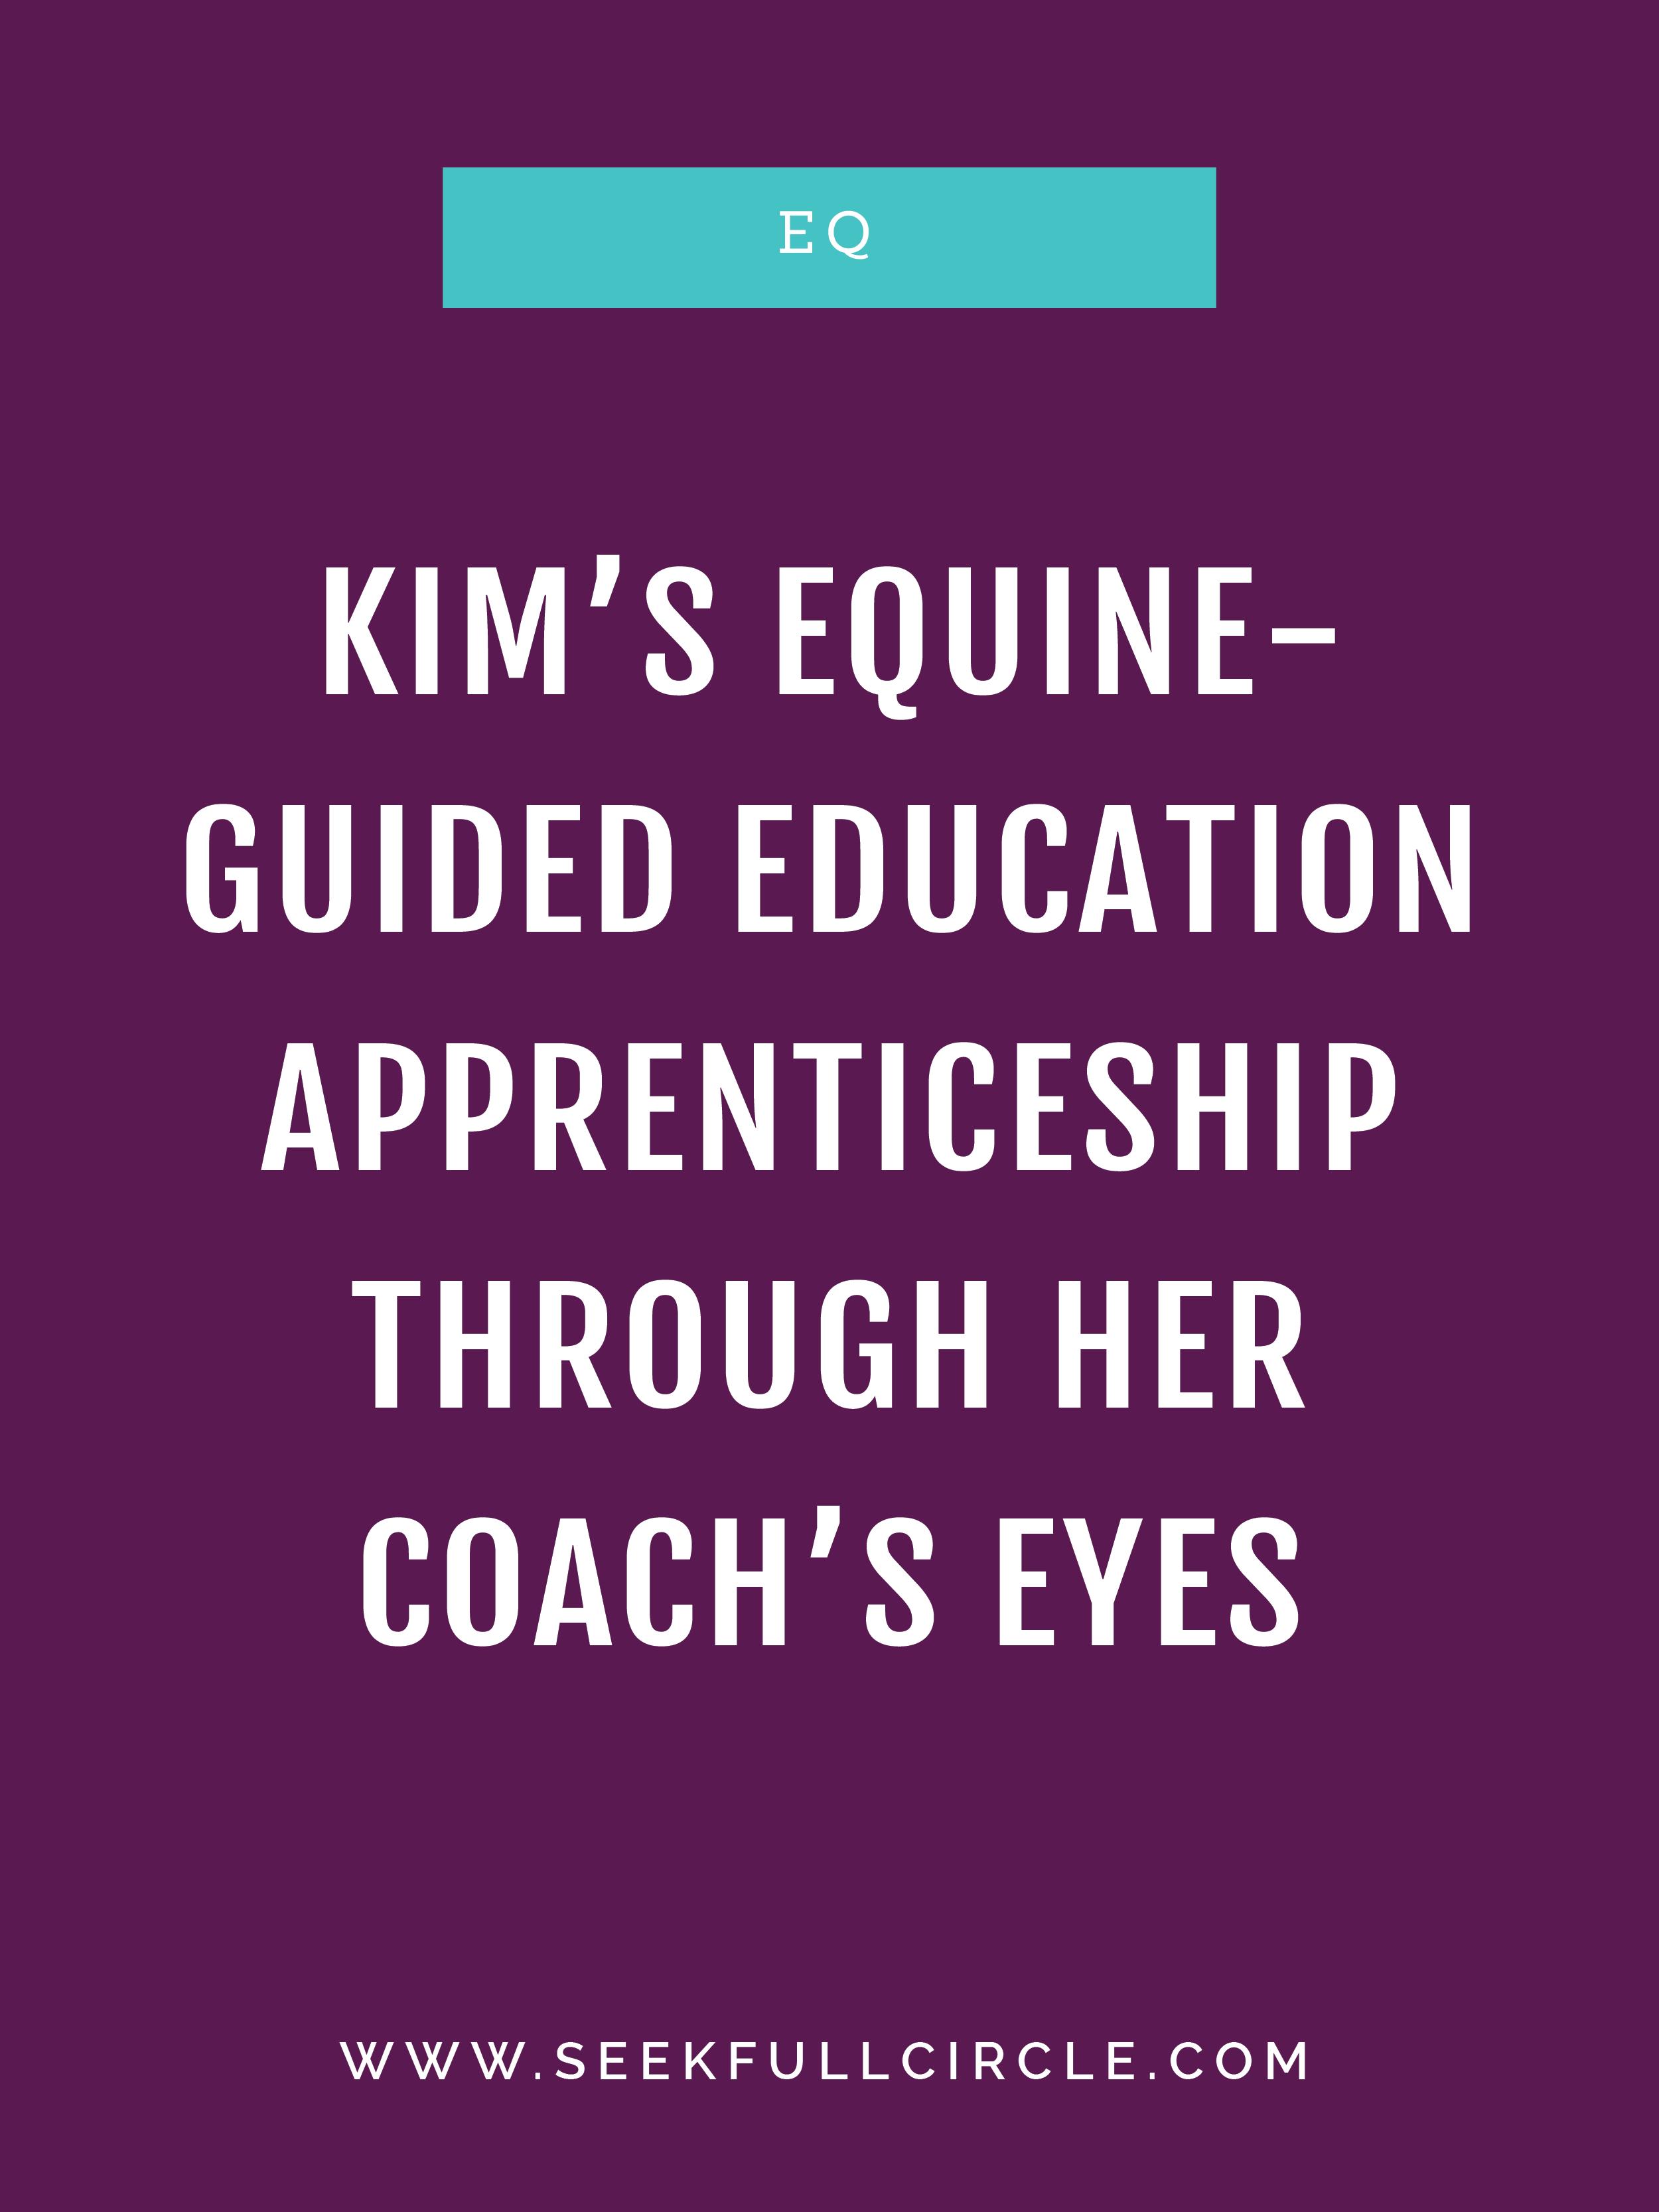 kim's ege through coach eyes blog post image.png